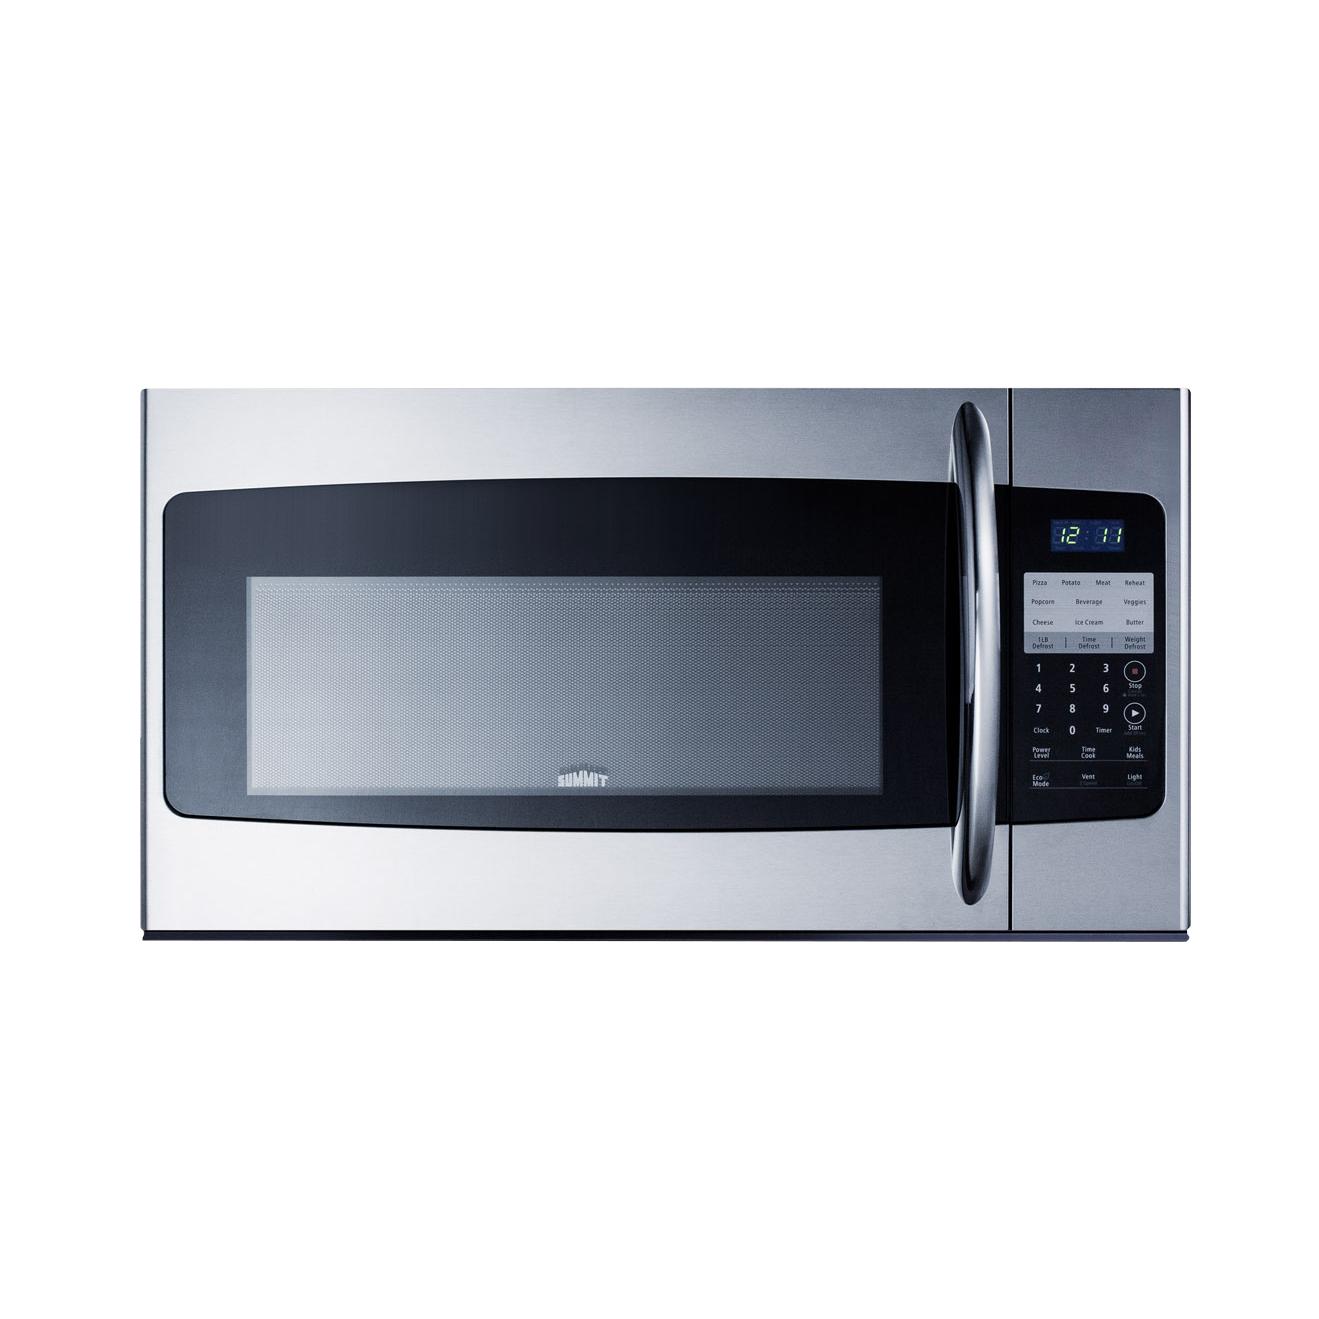 Summit Appliance OTRSS301 microwave oven